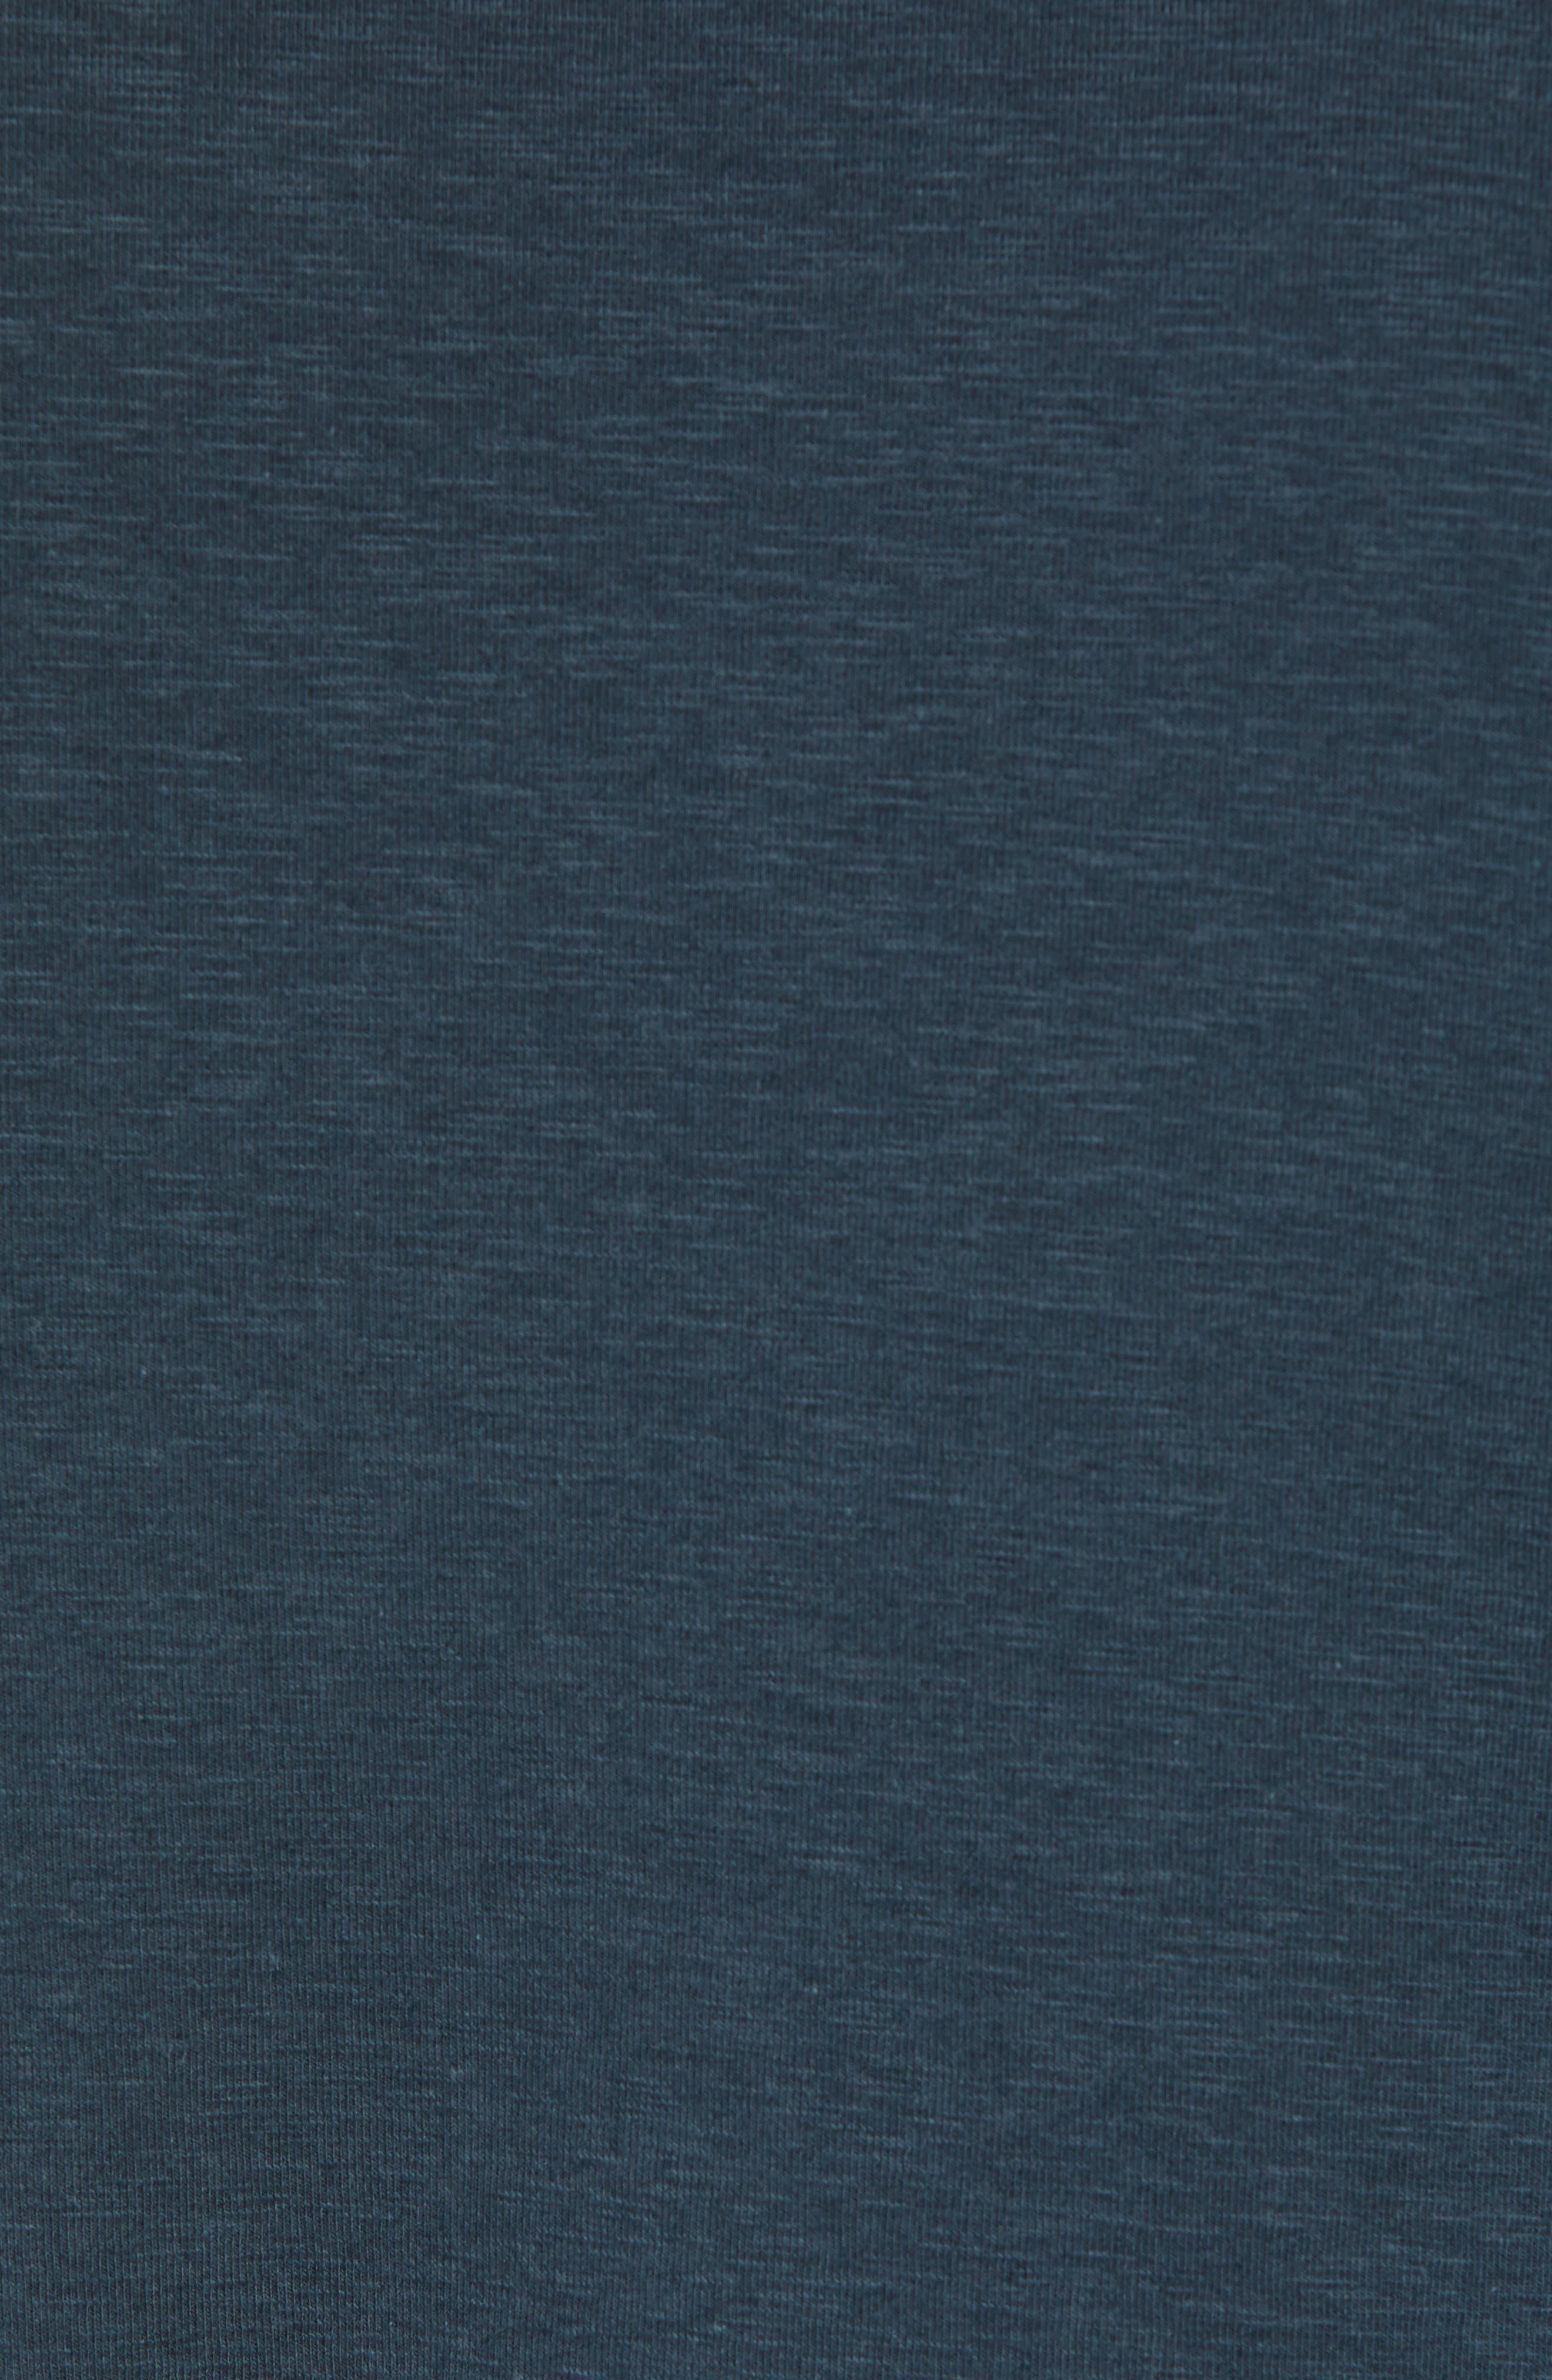 Douglas Slub Long Sleeve T-Shirt,                             Alternate thumbnail 5, color,                             TEAL